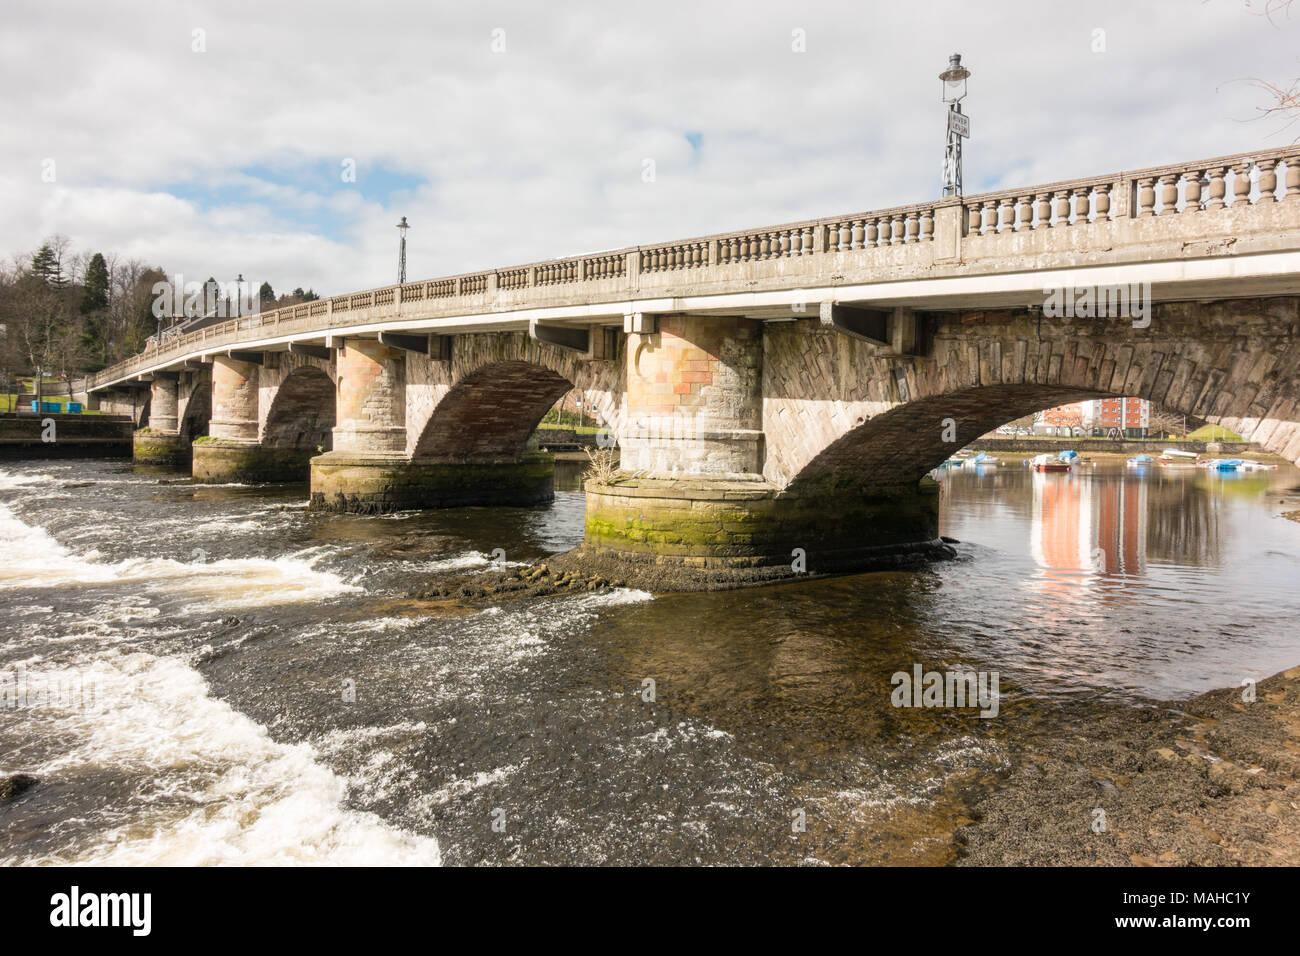 Old Dumbarton Bridge over the River Leven, Dumbarton, Scotland, UK - Stock Image